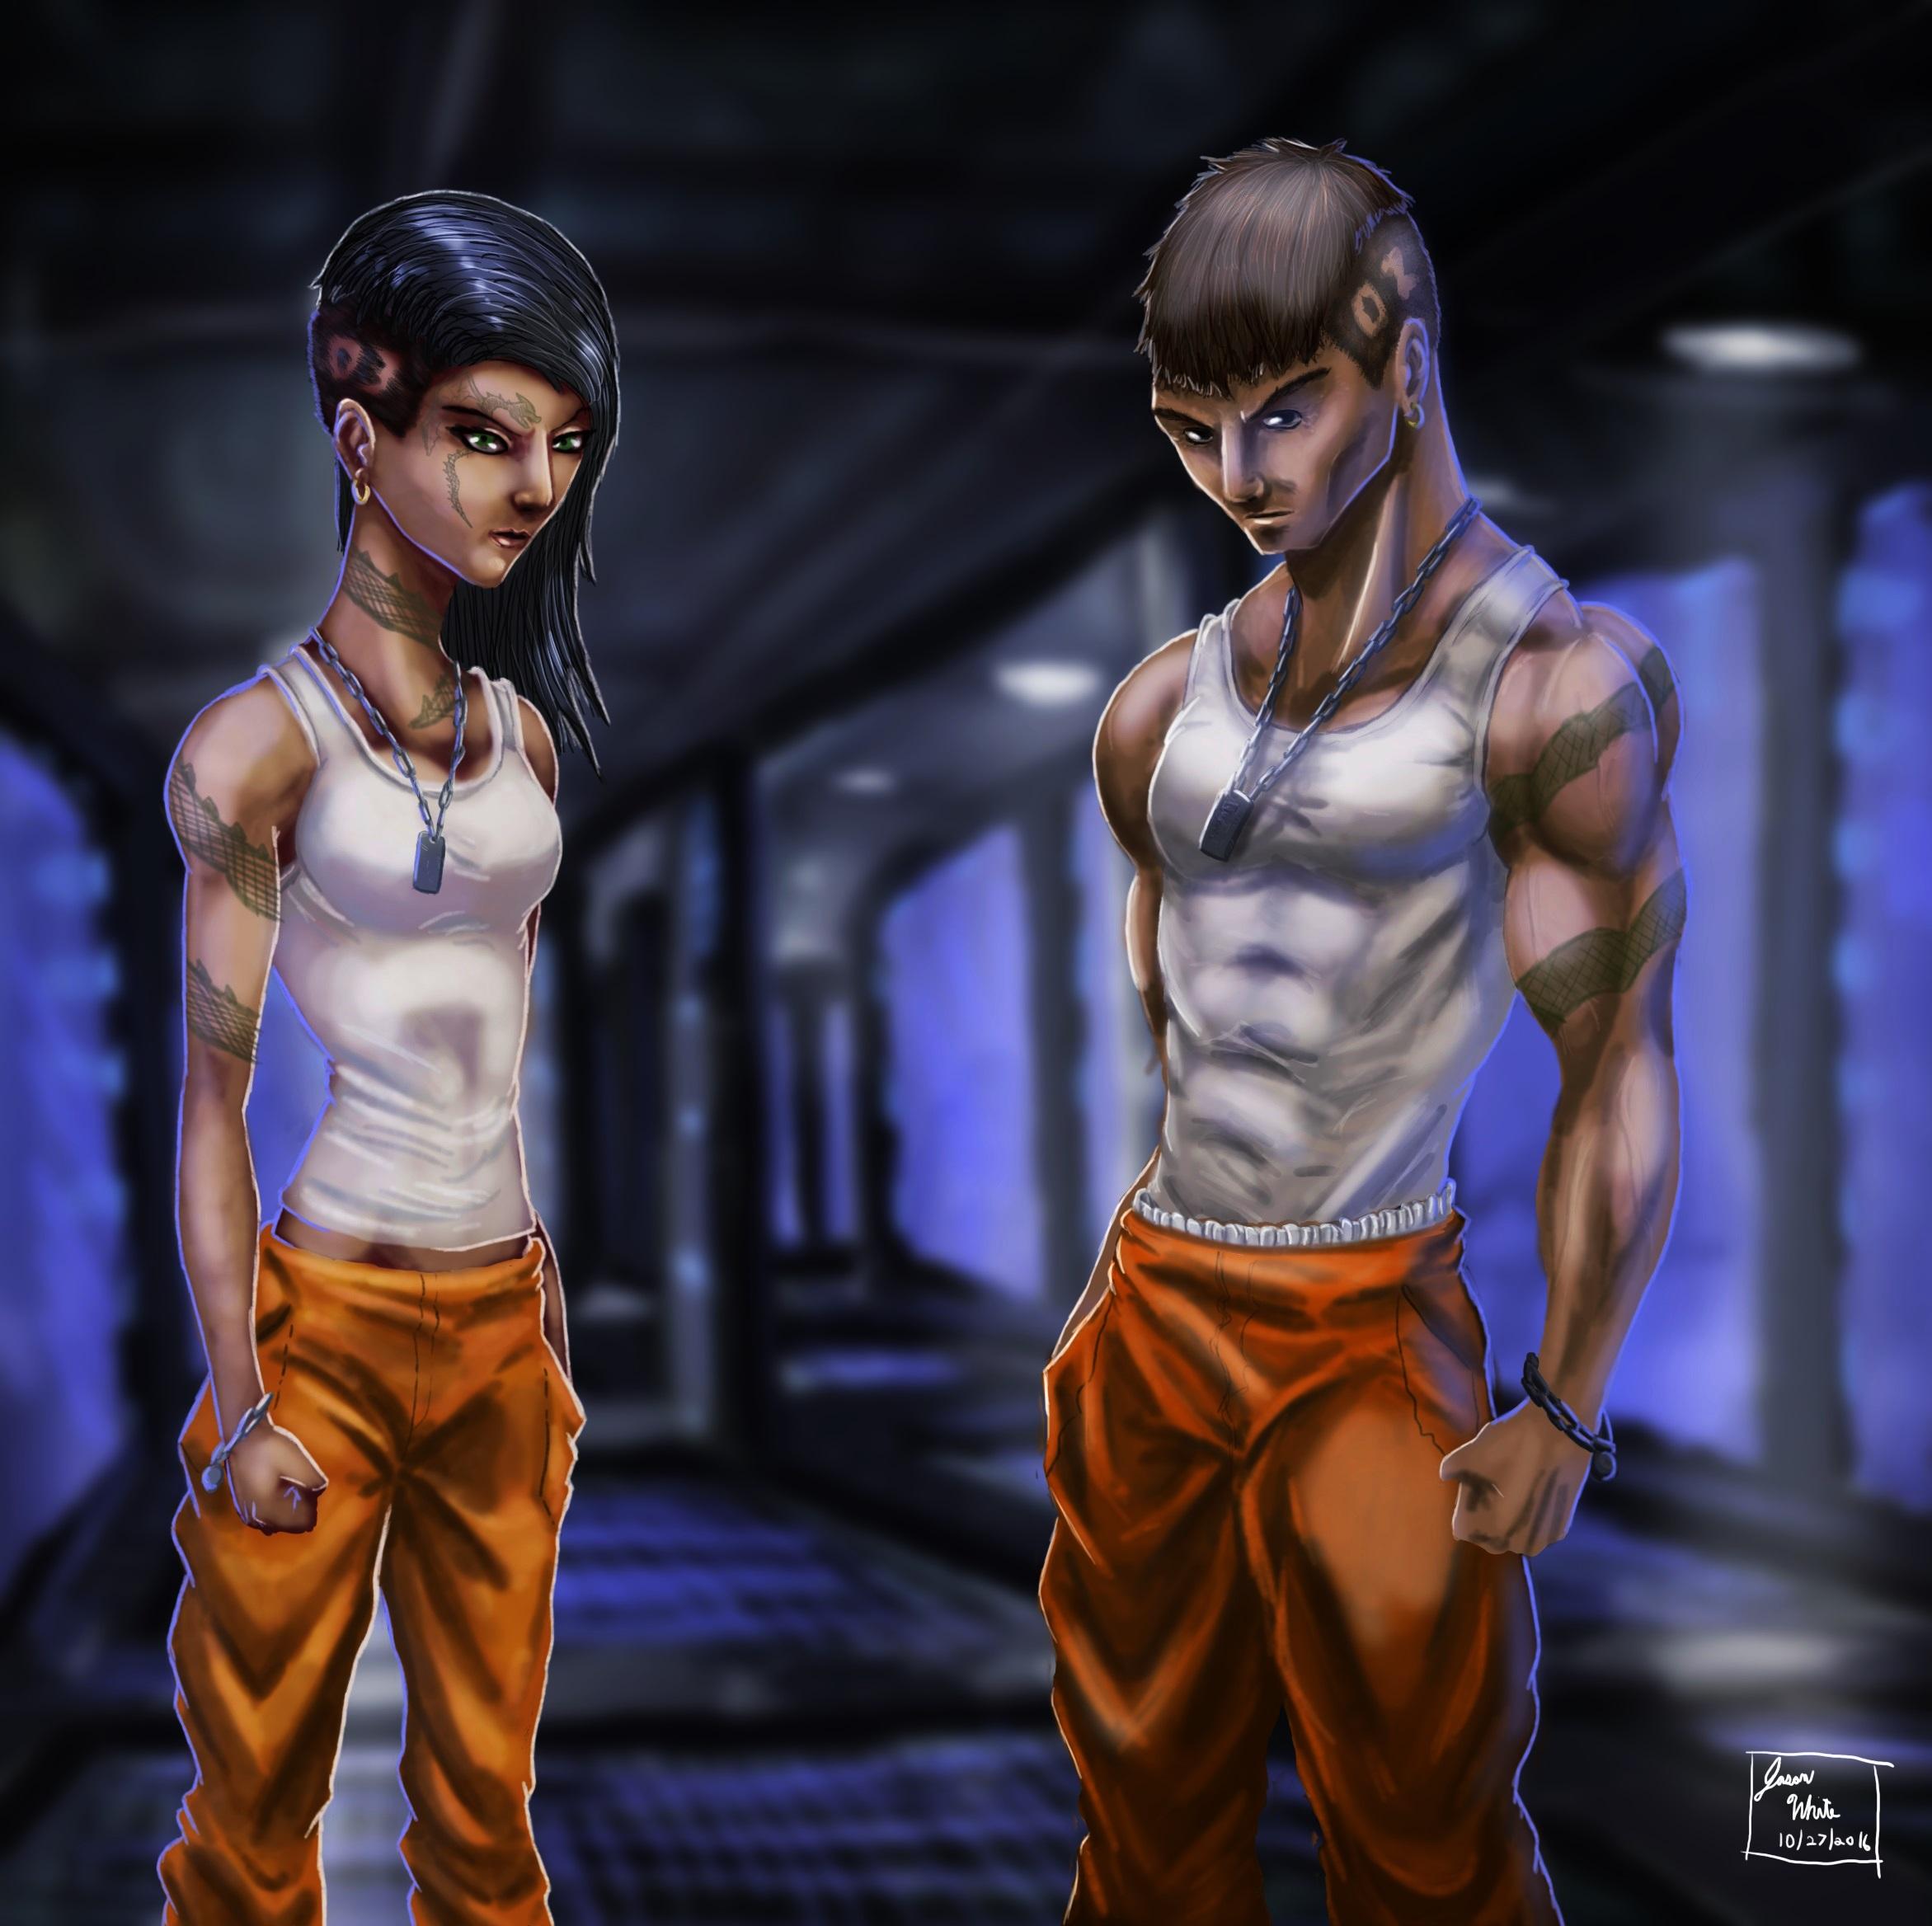 SpaceShip Inmates